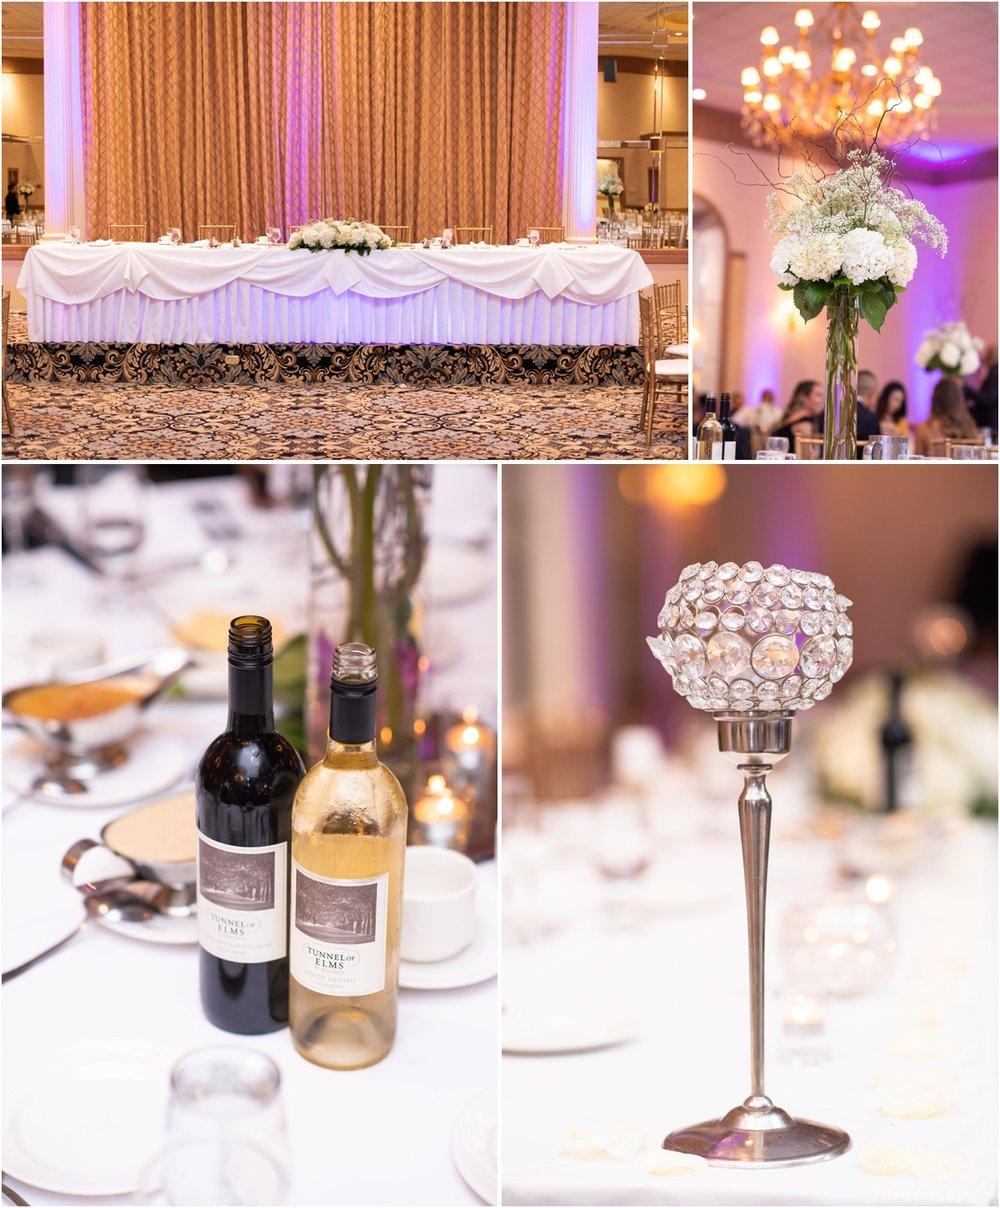 Meridian Banquets Wedding, Rolling Meadows Illinois Wedding, Chicago Wedding Photographer, Aurora Wedding Photographer, Best Photographer In Aurora, Best Photographer In Chicago_0089.jpg